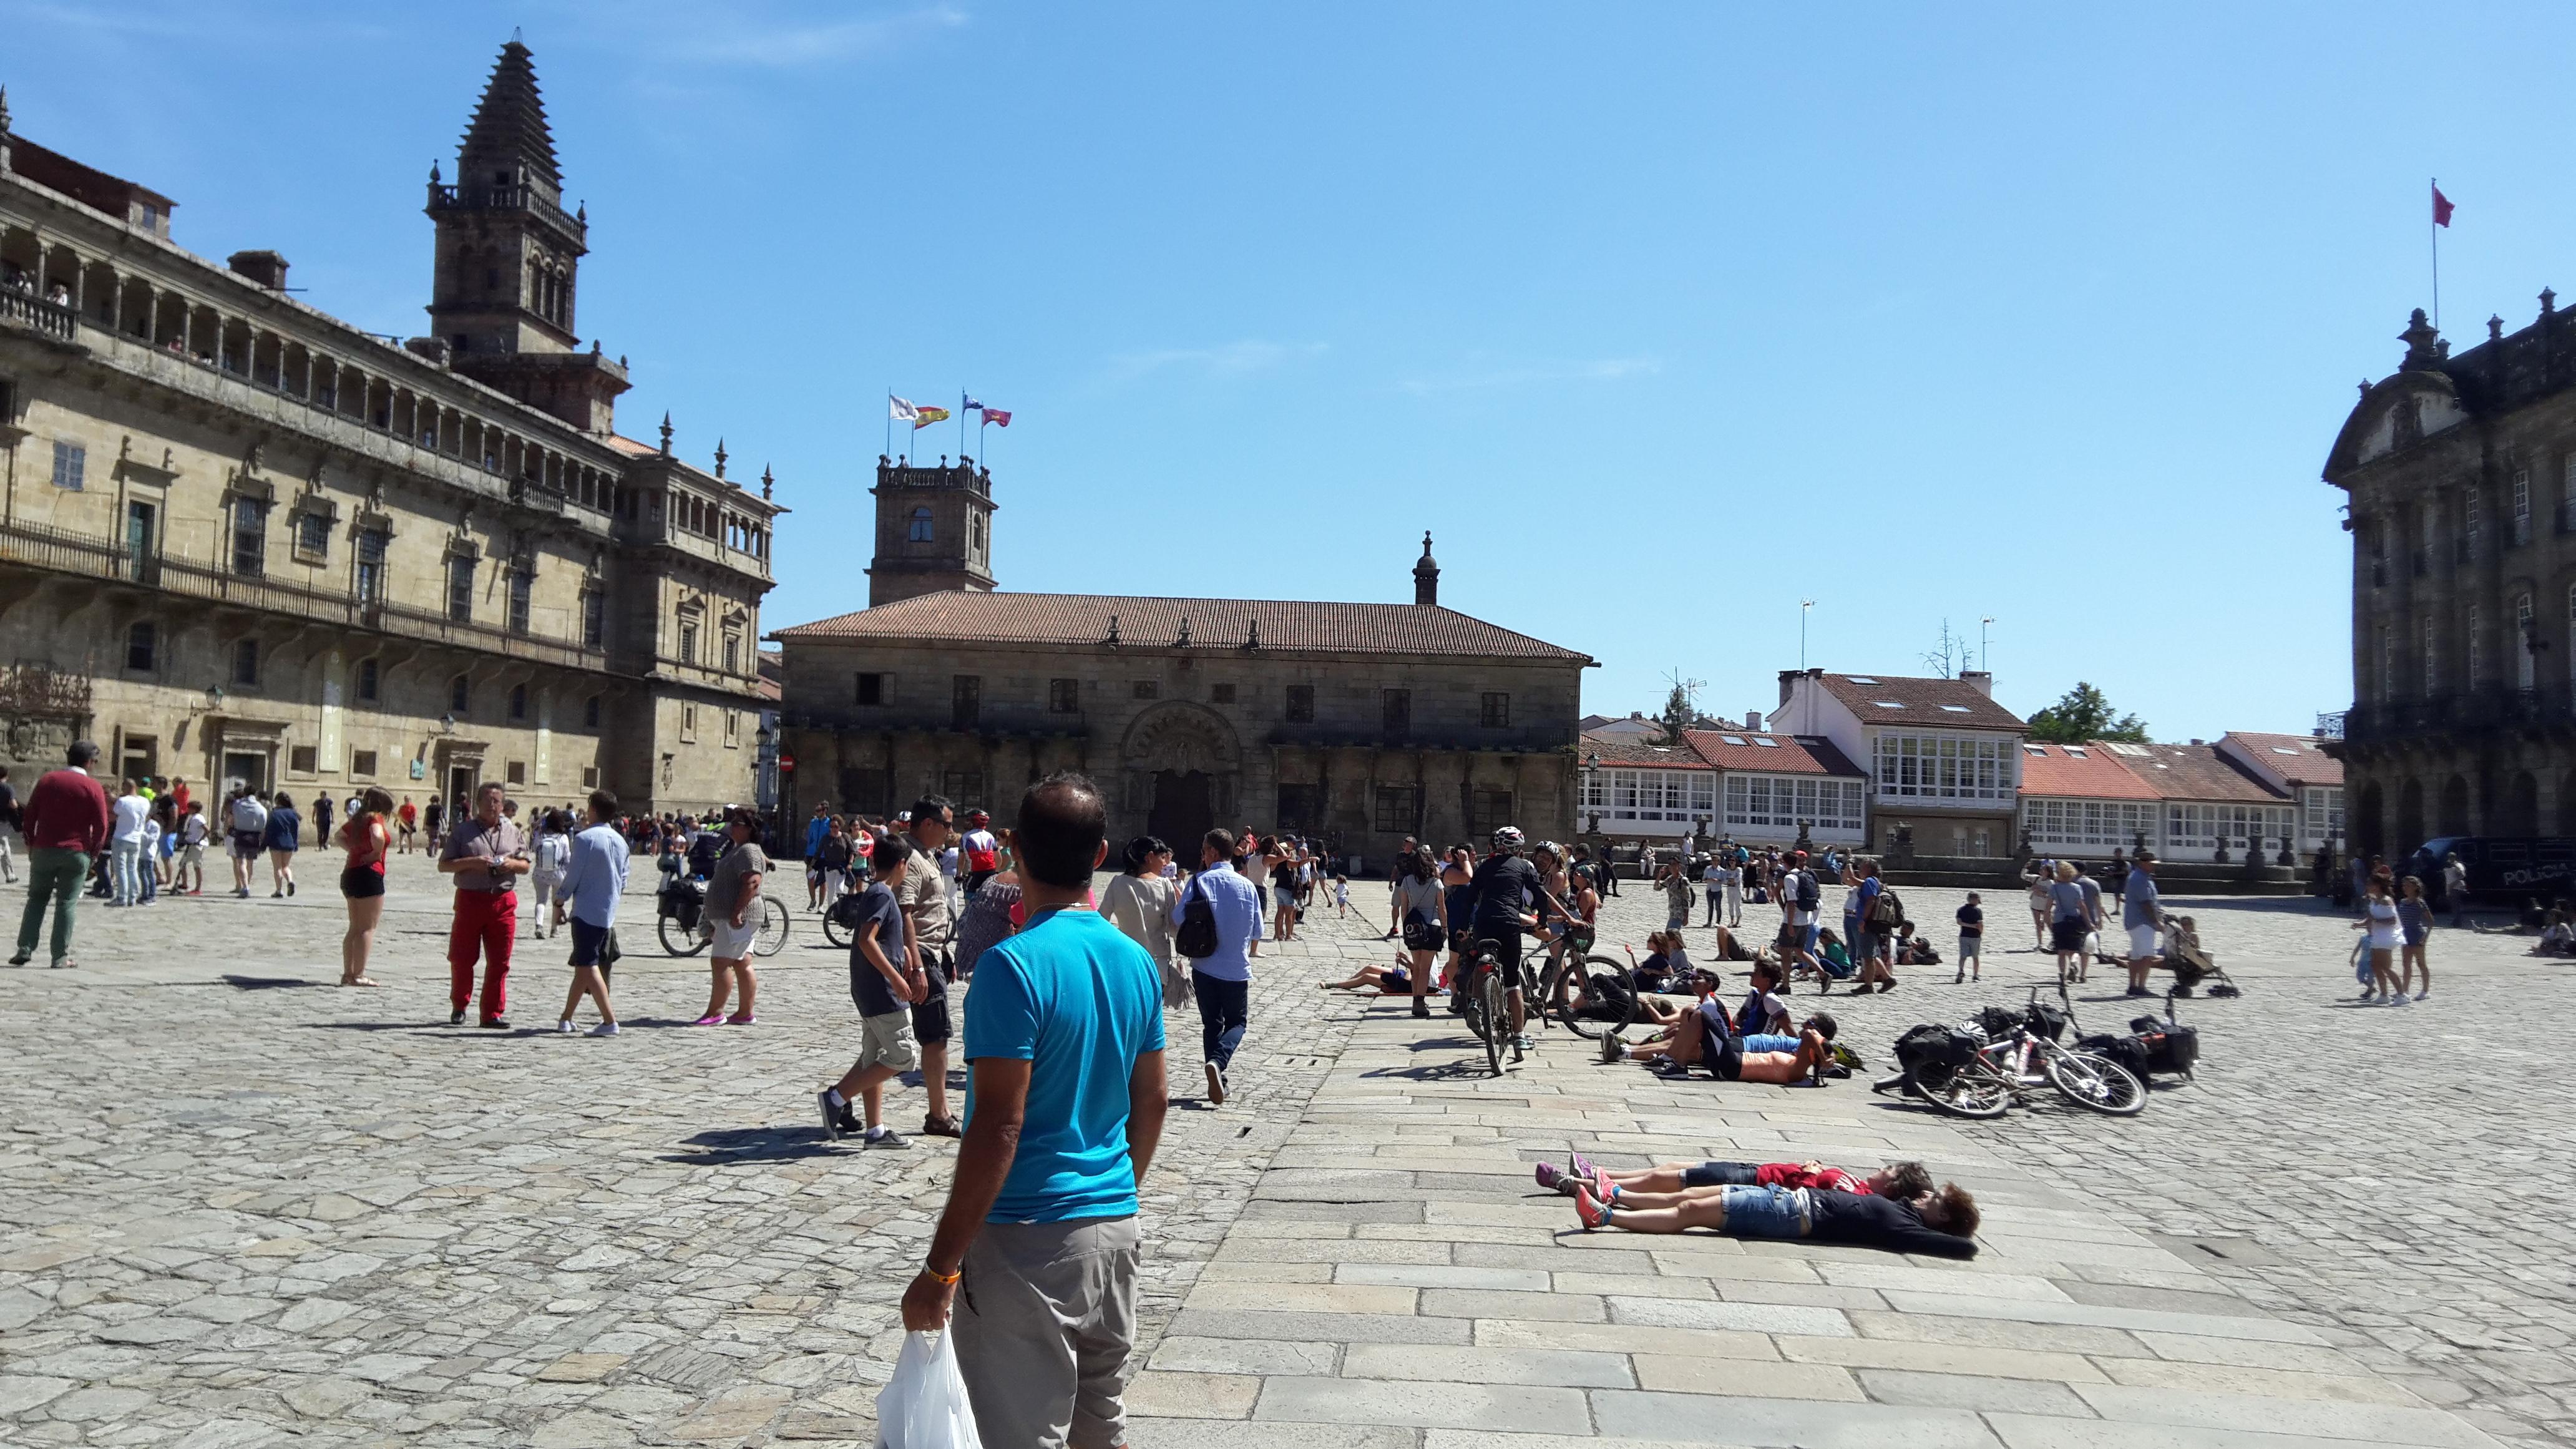 Santiago de Compostela Plaza del Obradoiro